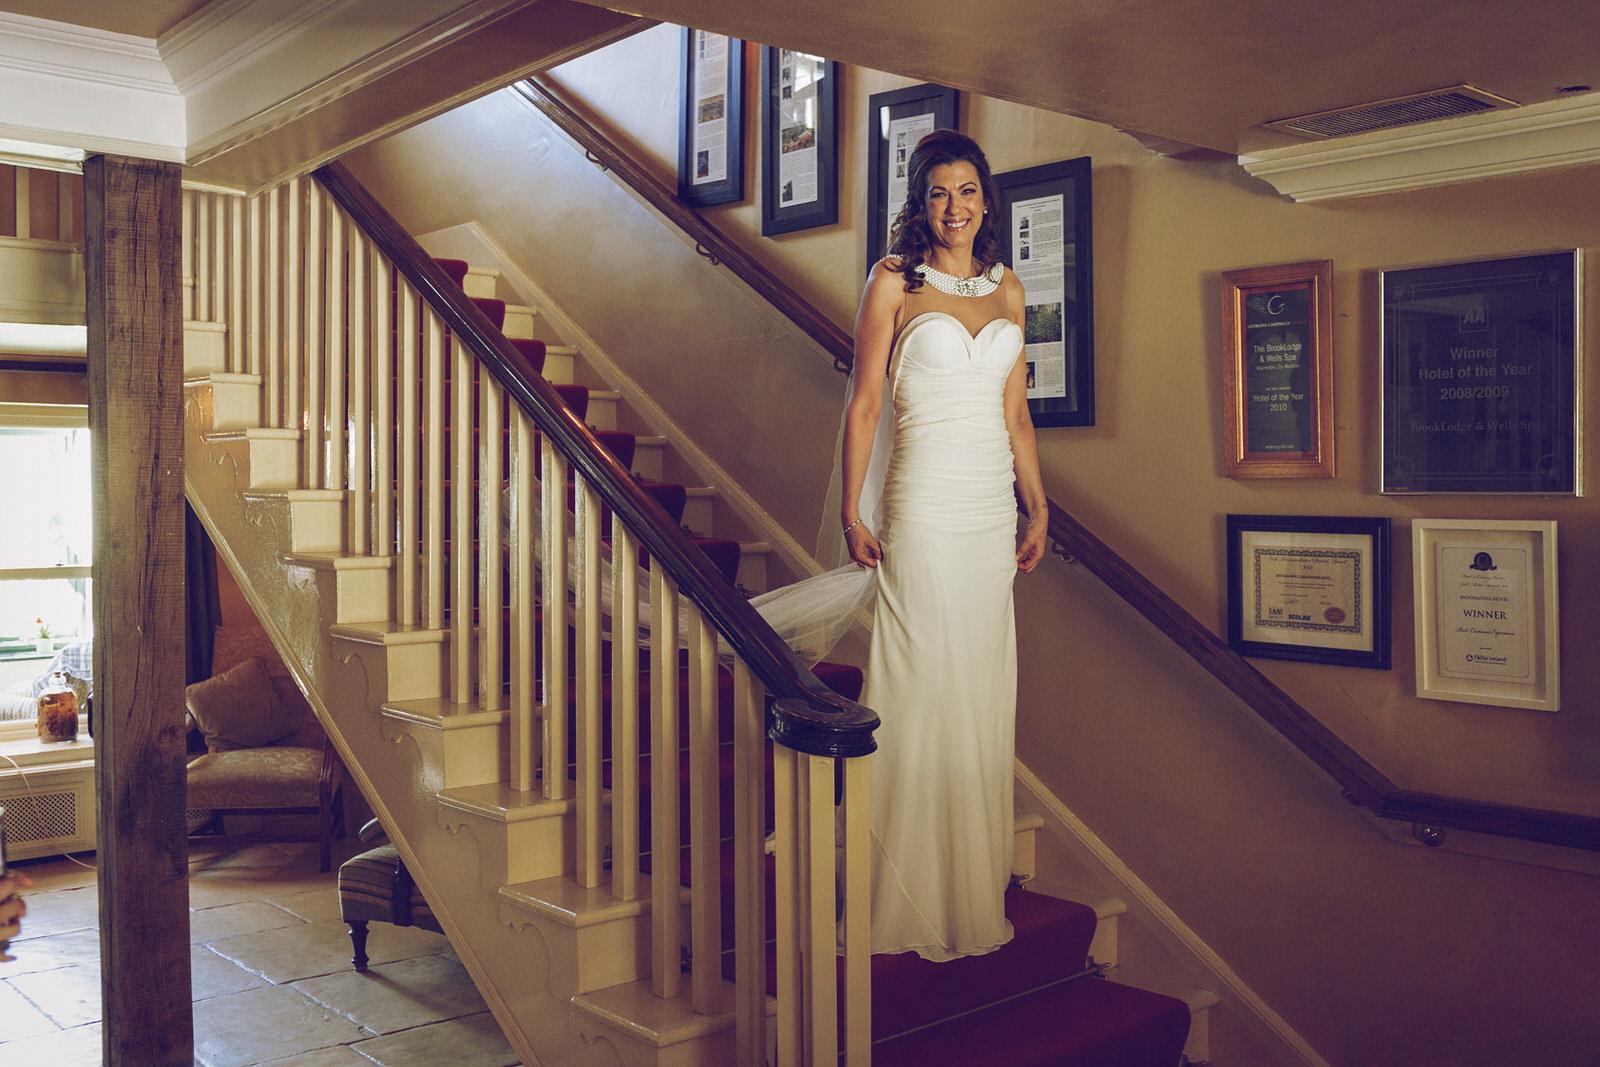 Brooklodge-wicklow-wedding-photographer_026.jpg